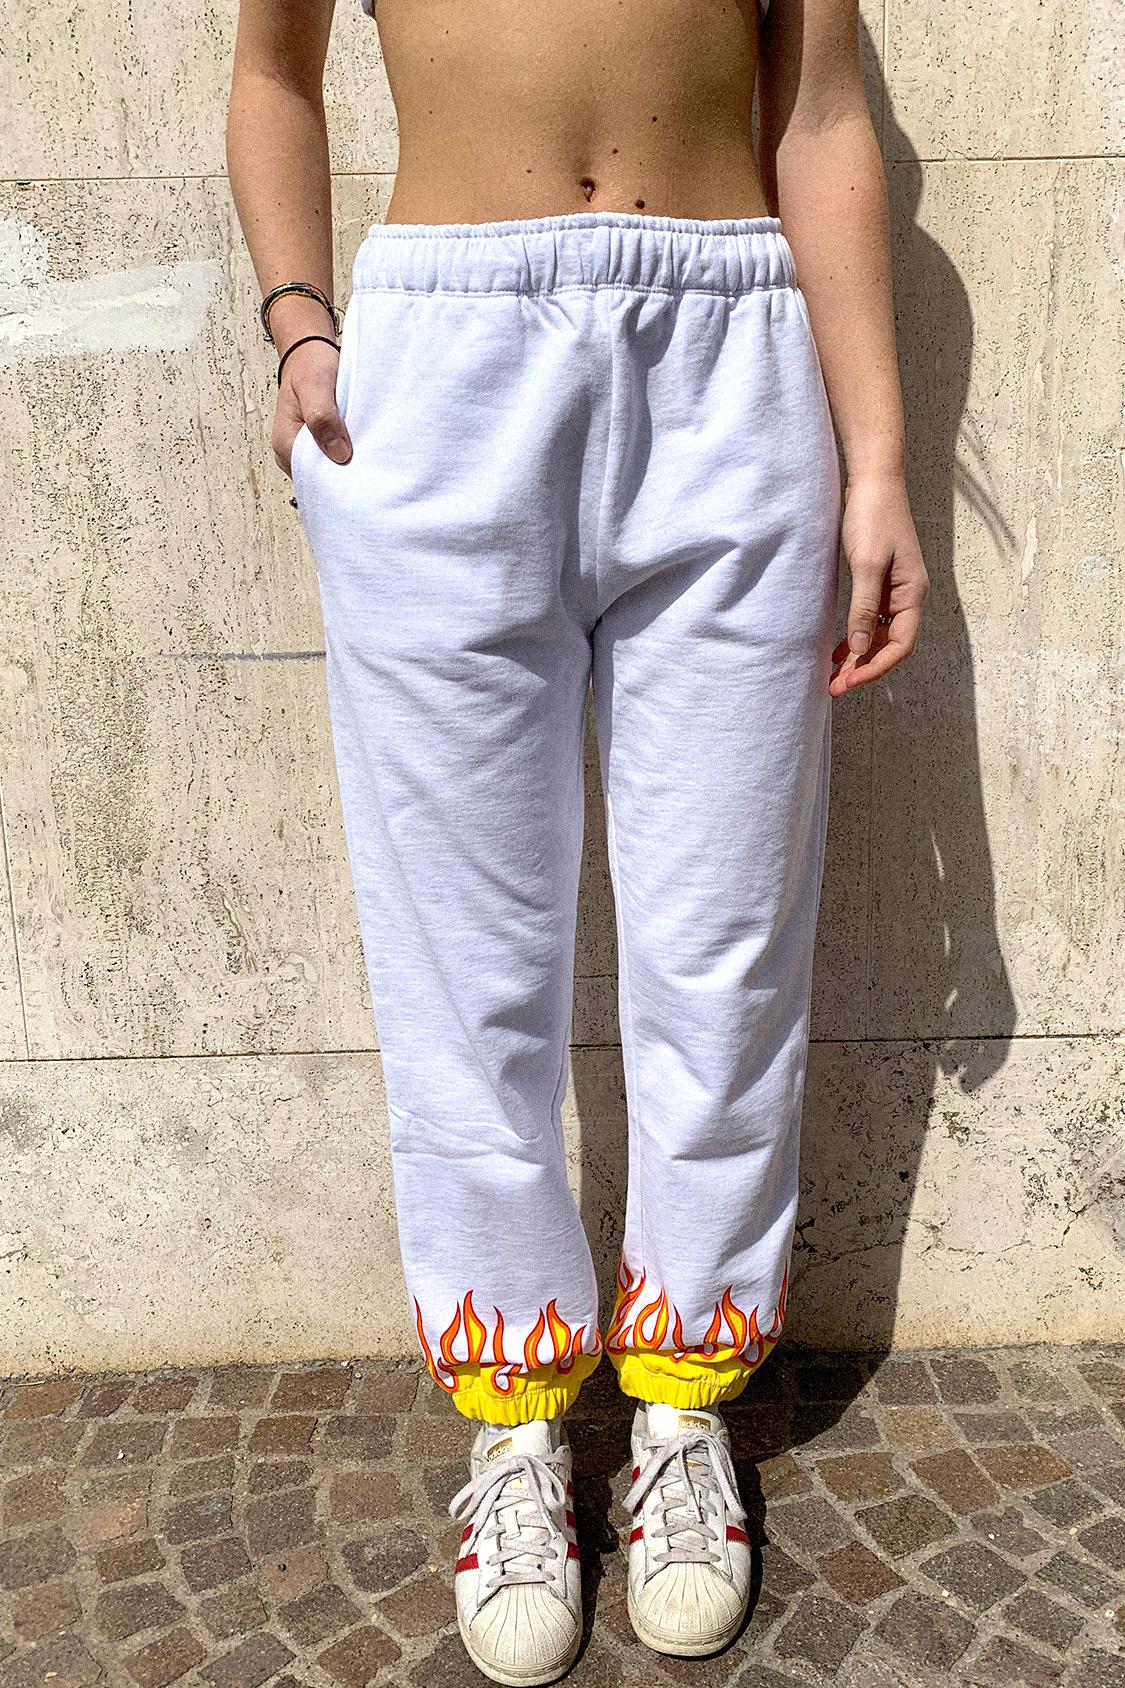 Pantaloni tuta fiamme